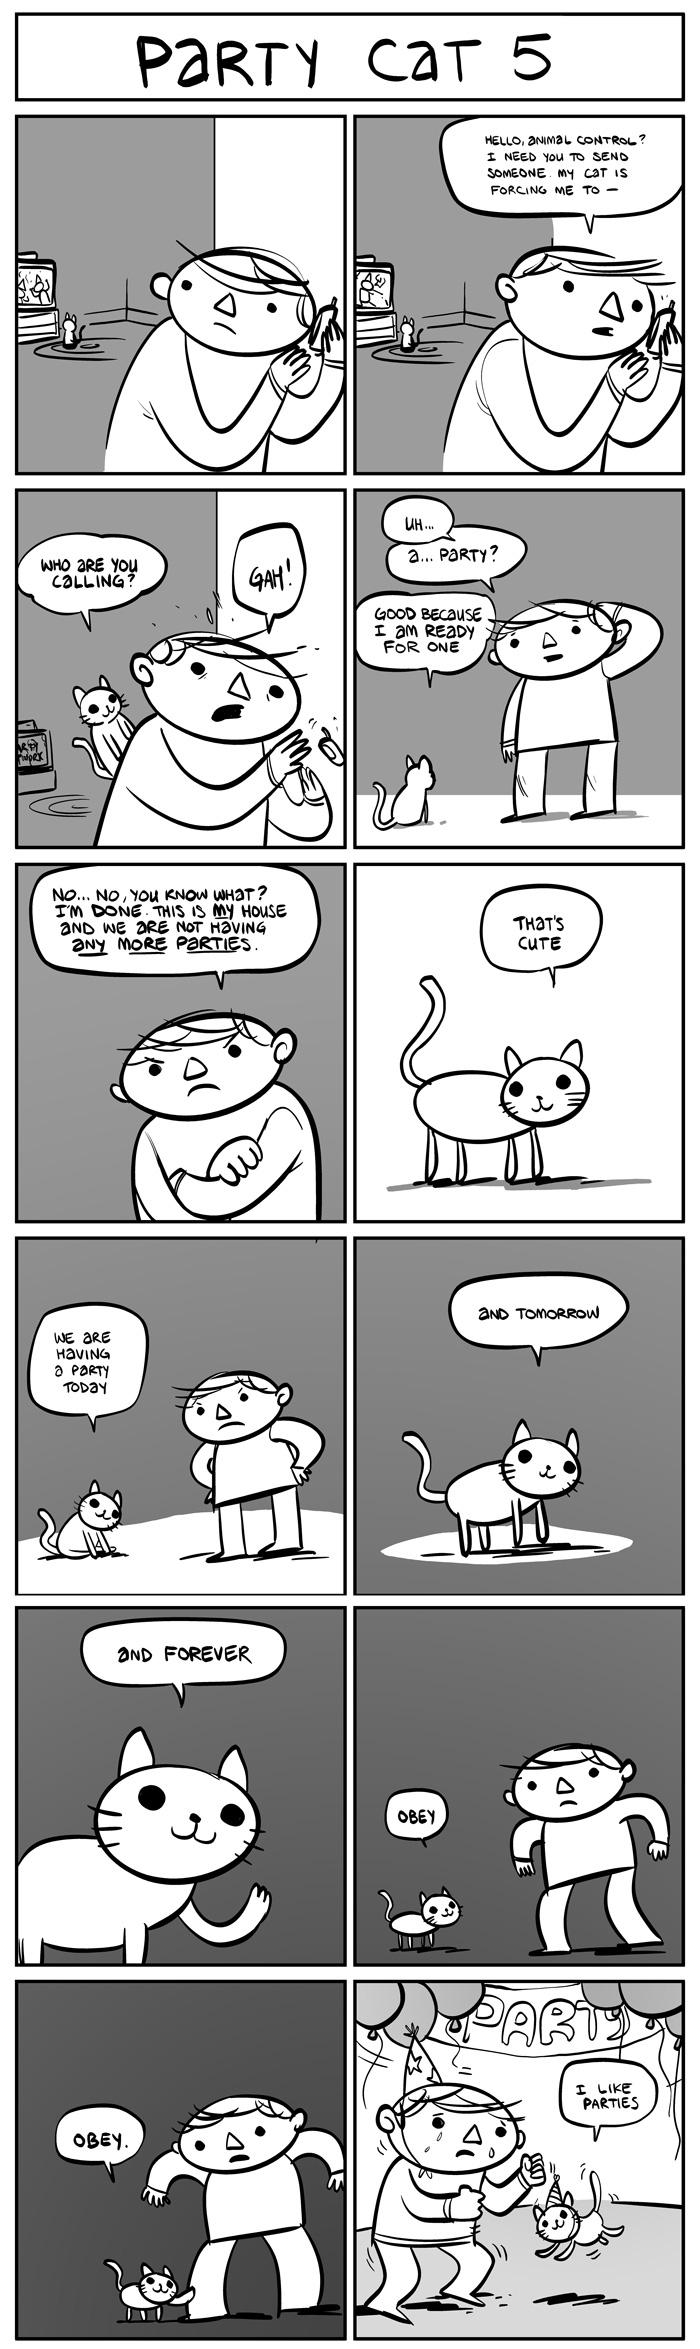 partycat1